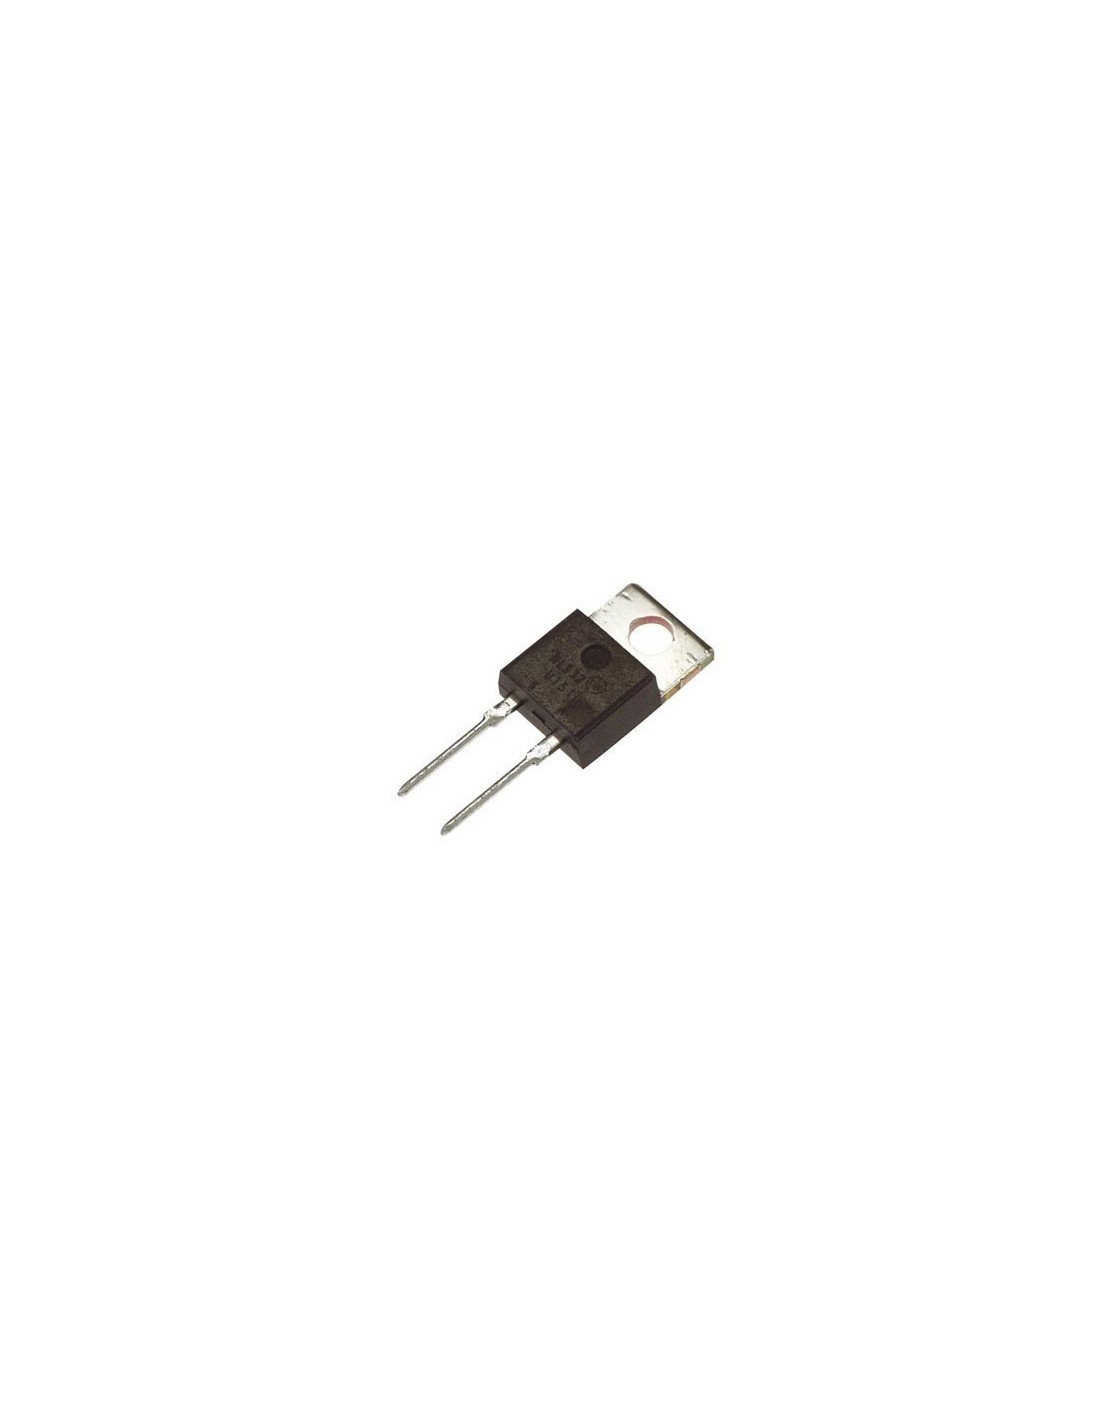 Perel 144576 Schottky Diode, 15 A, 100 V 15A 100V